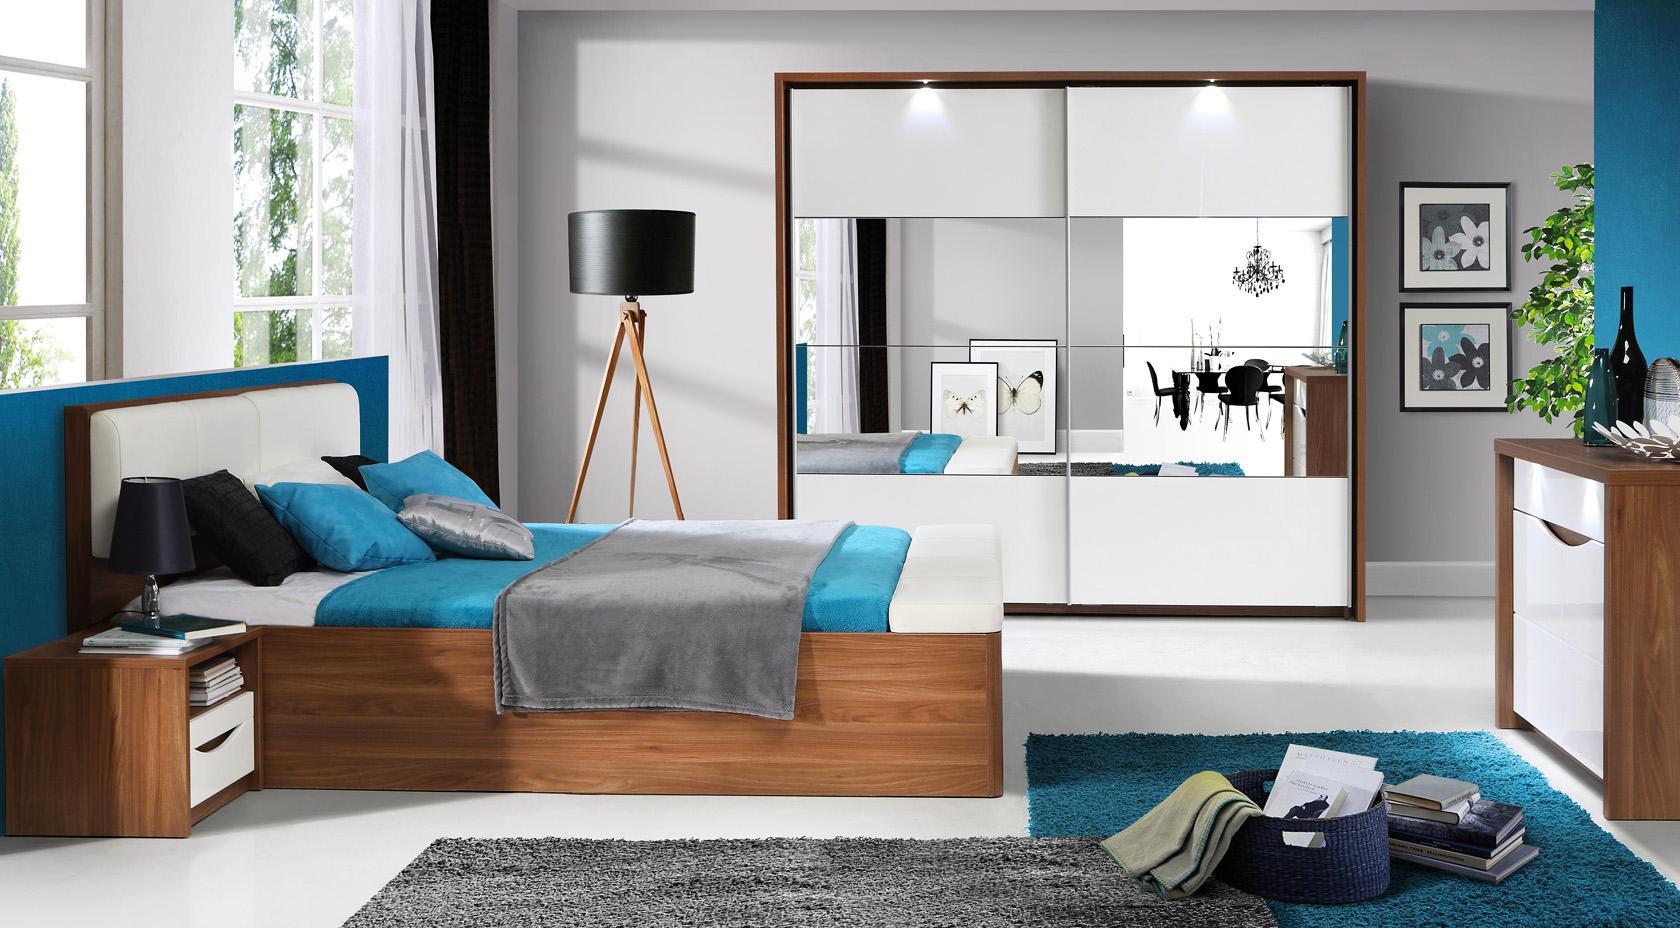 Meble systemowe Saint Tropez do sypialni marki Forte